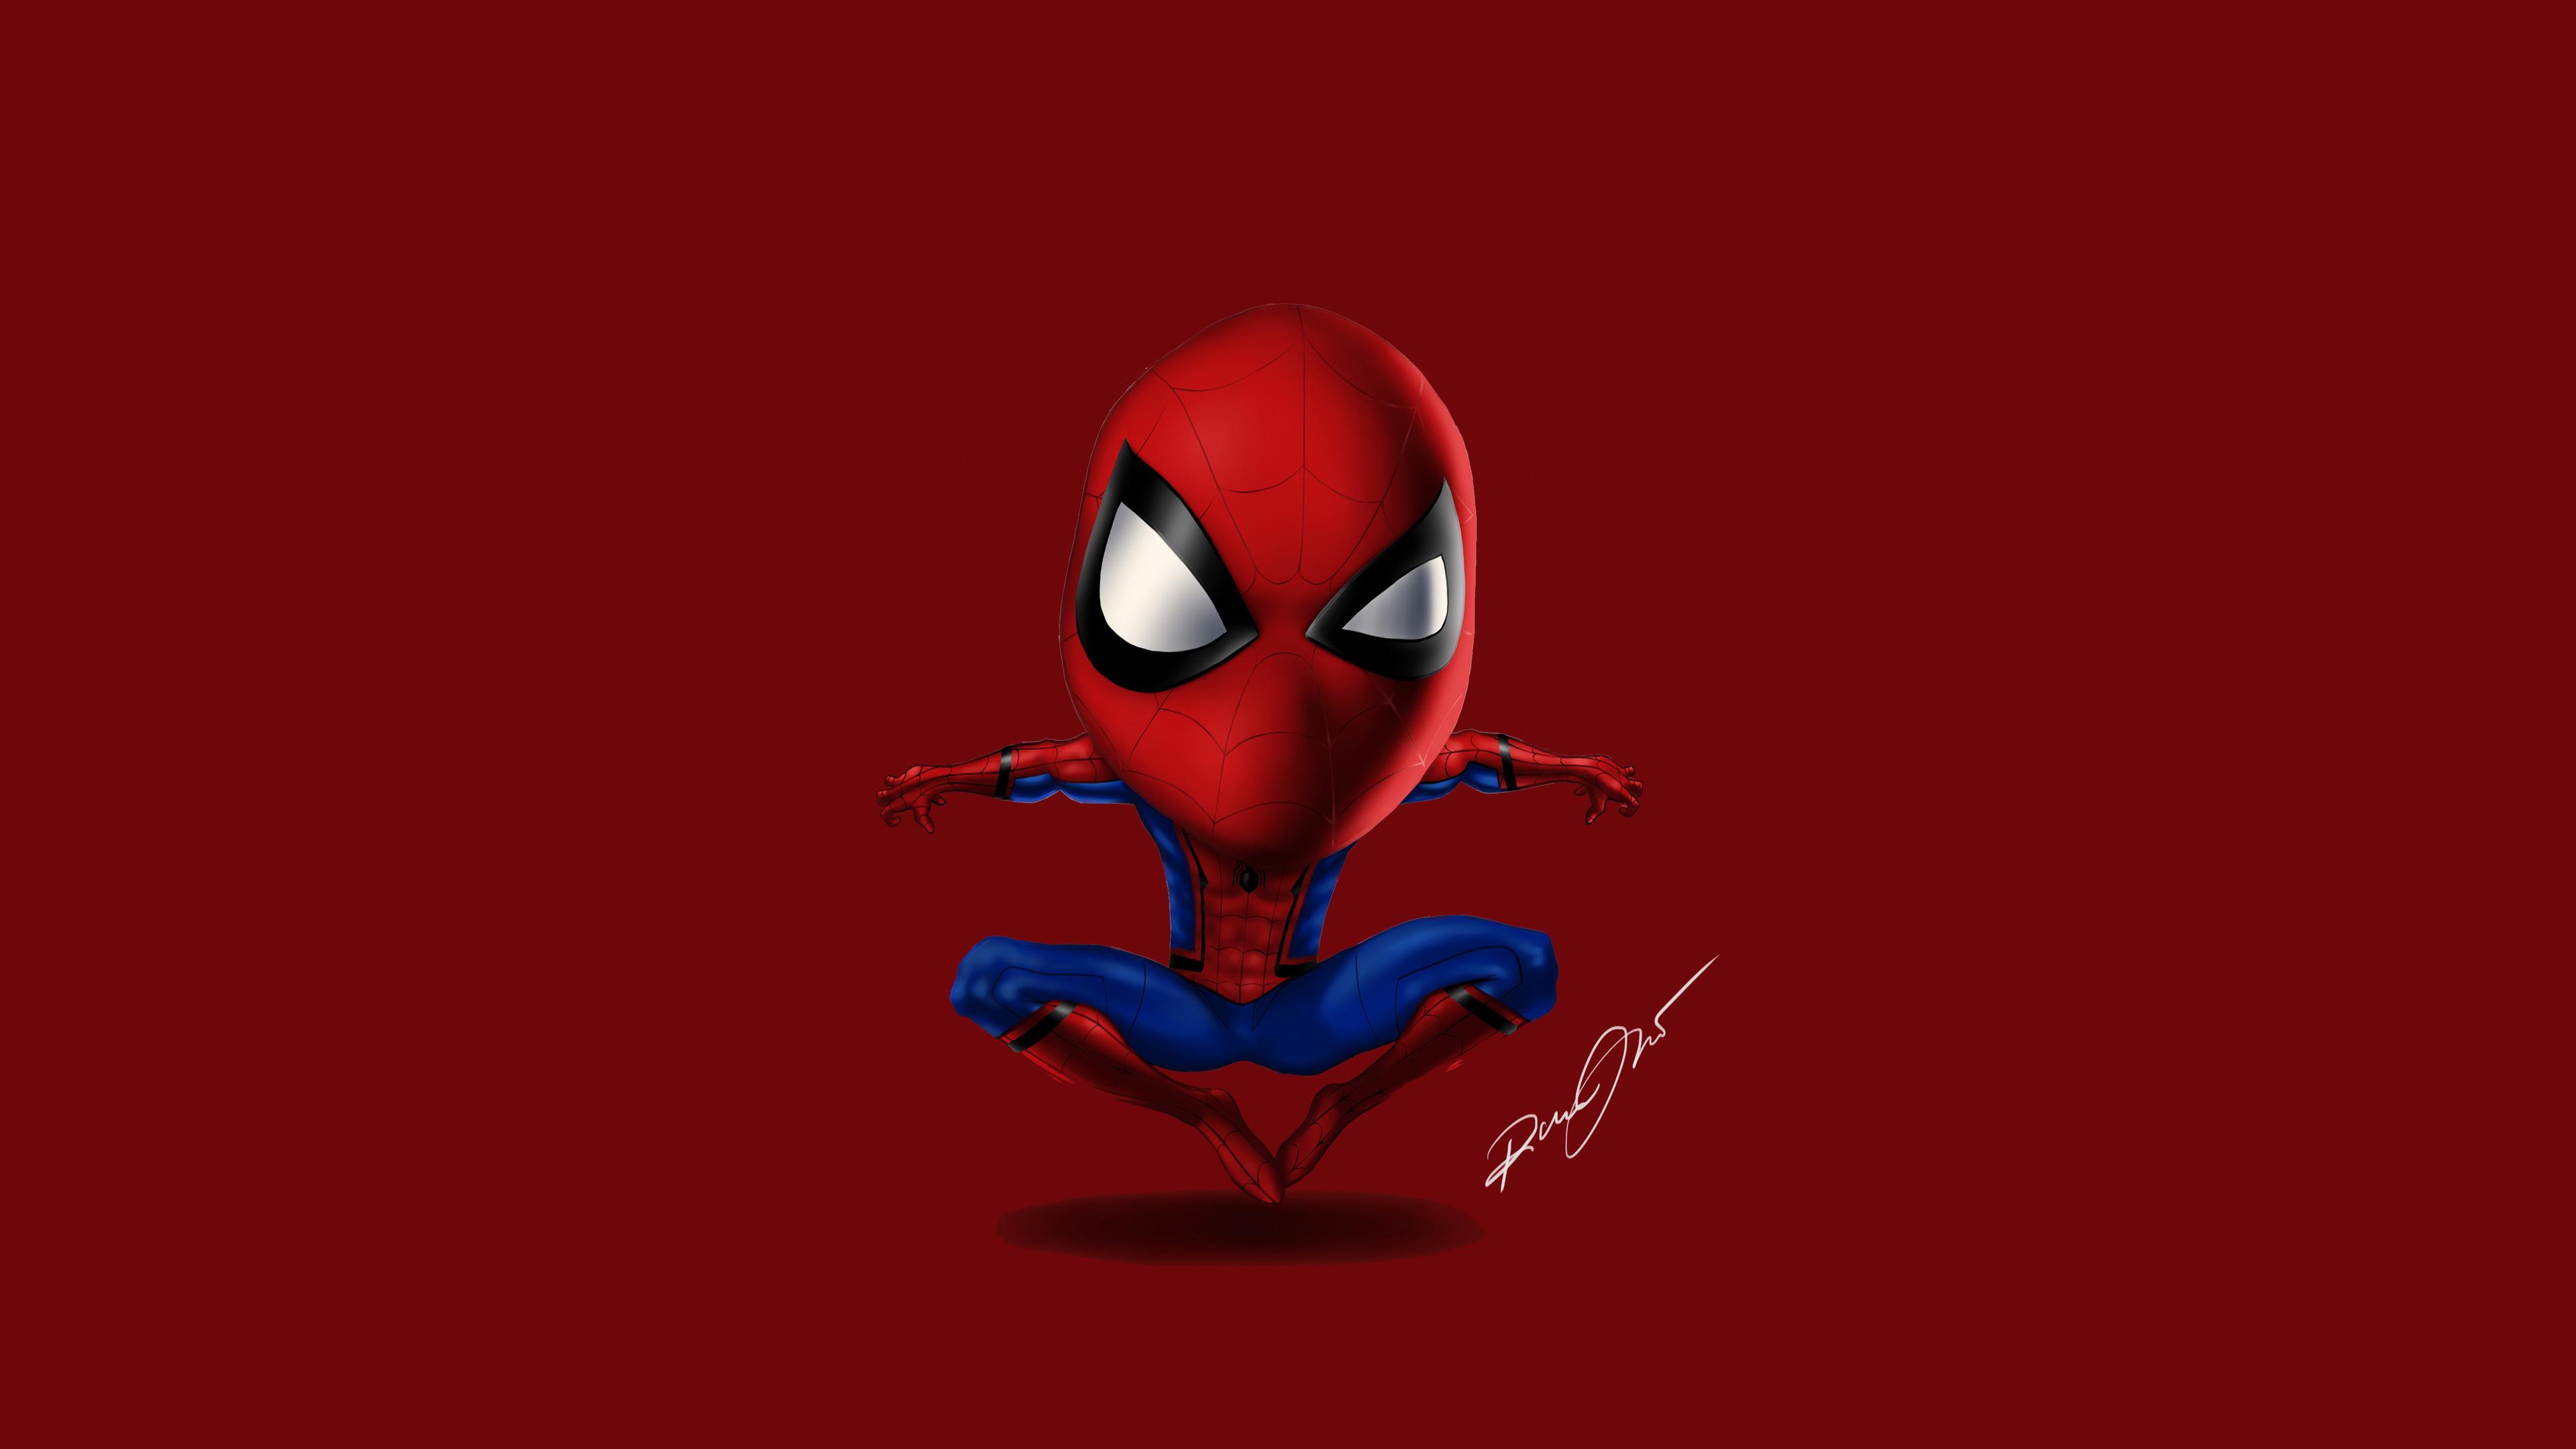 spiderman 5k digital artwork 1536523670 - Spiderman 5k Digital Artwork - superheroes wallpapers, spiderman wallpapers, hd-wallpapers, digital art wallpapers, artwork wallpapers, artist wallpapers, 5k wallpapers, 4k-wallpapers